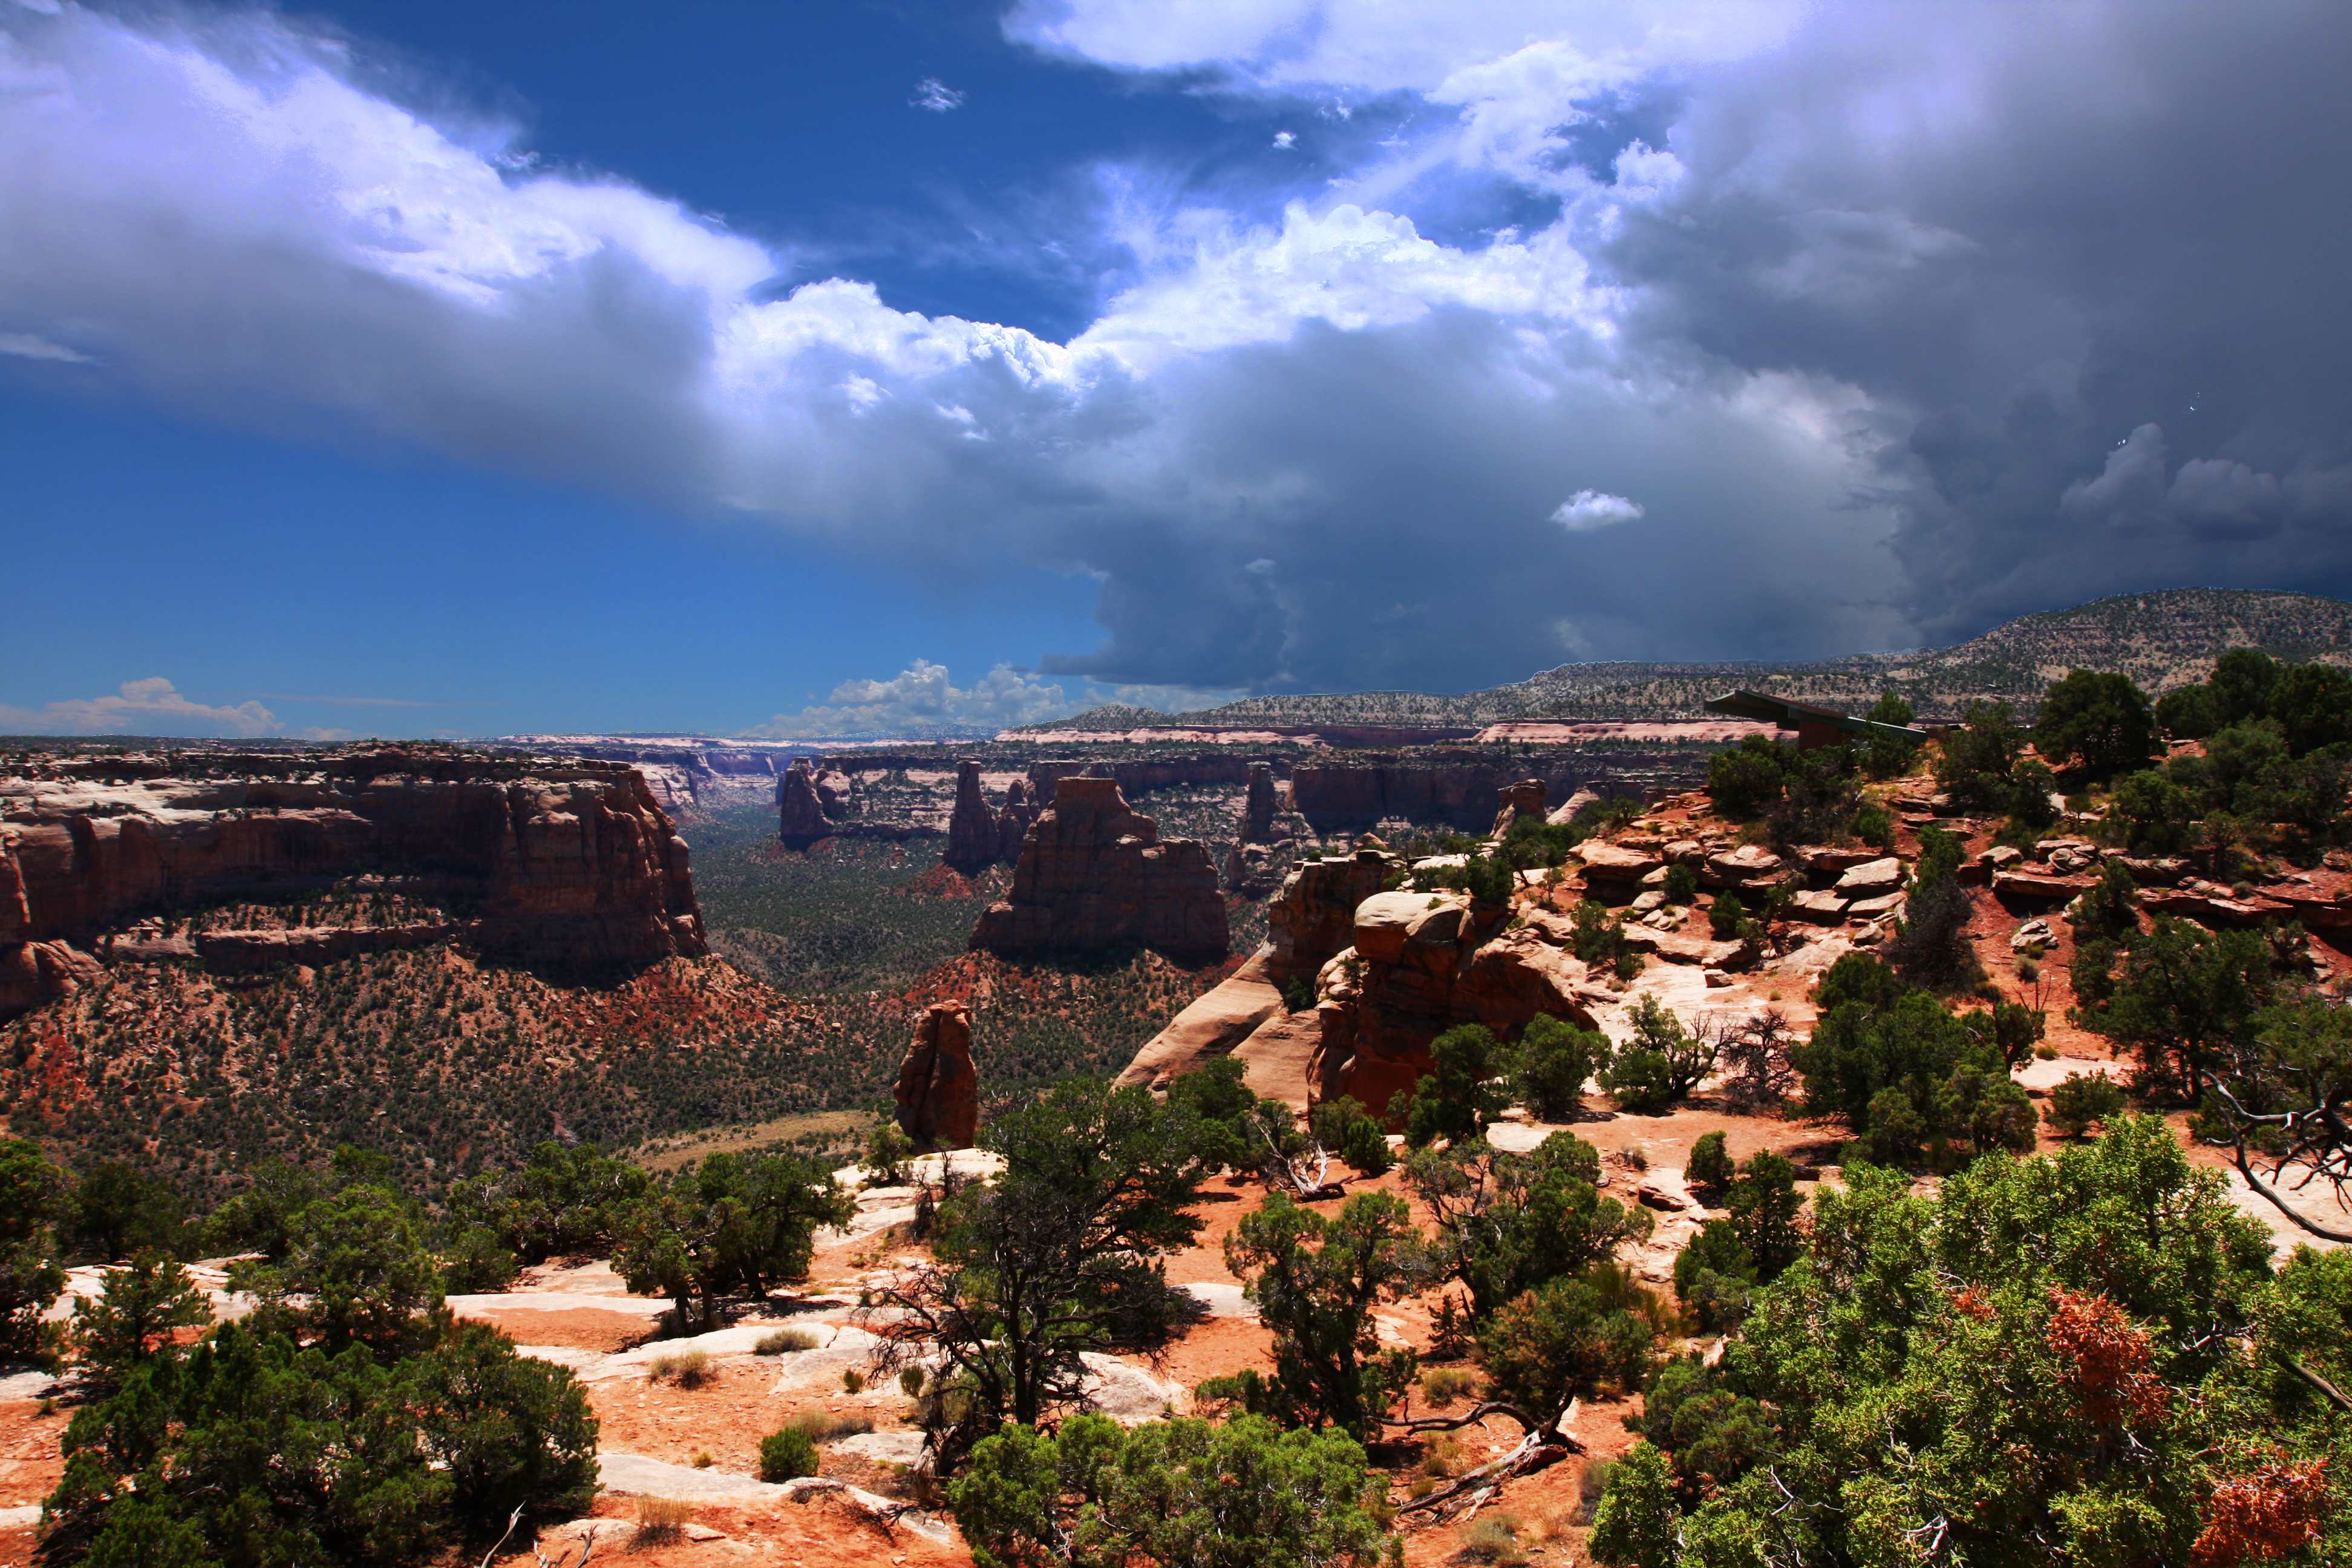 https://www.denverpenwomen.org/wp-content/uploads/2018/06/Colorado_National_Monument_4939640266.jpg